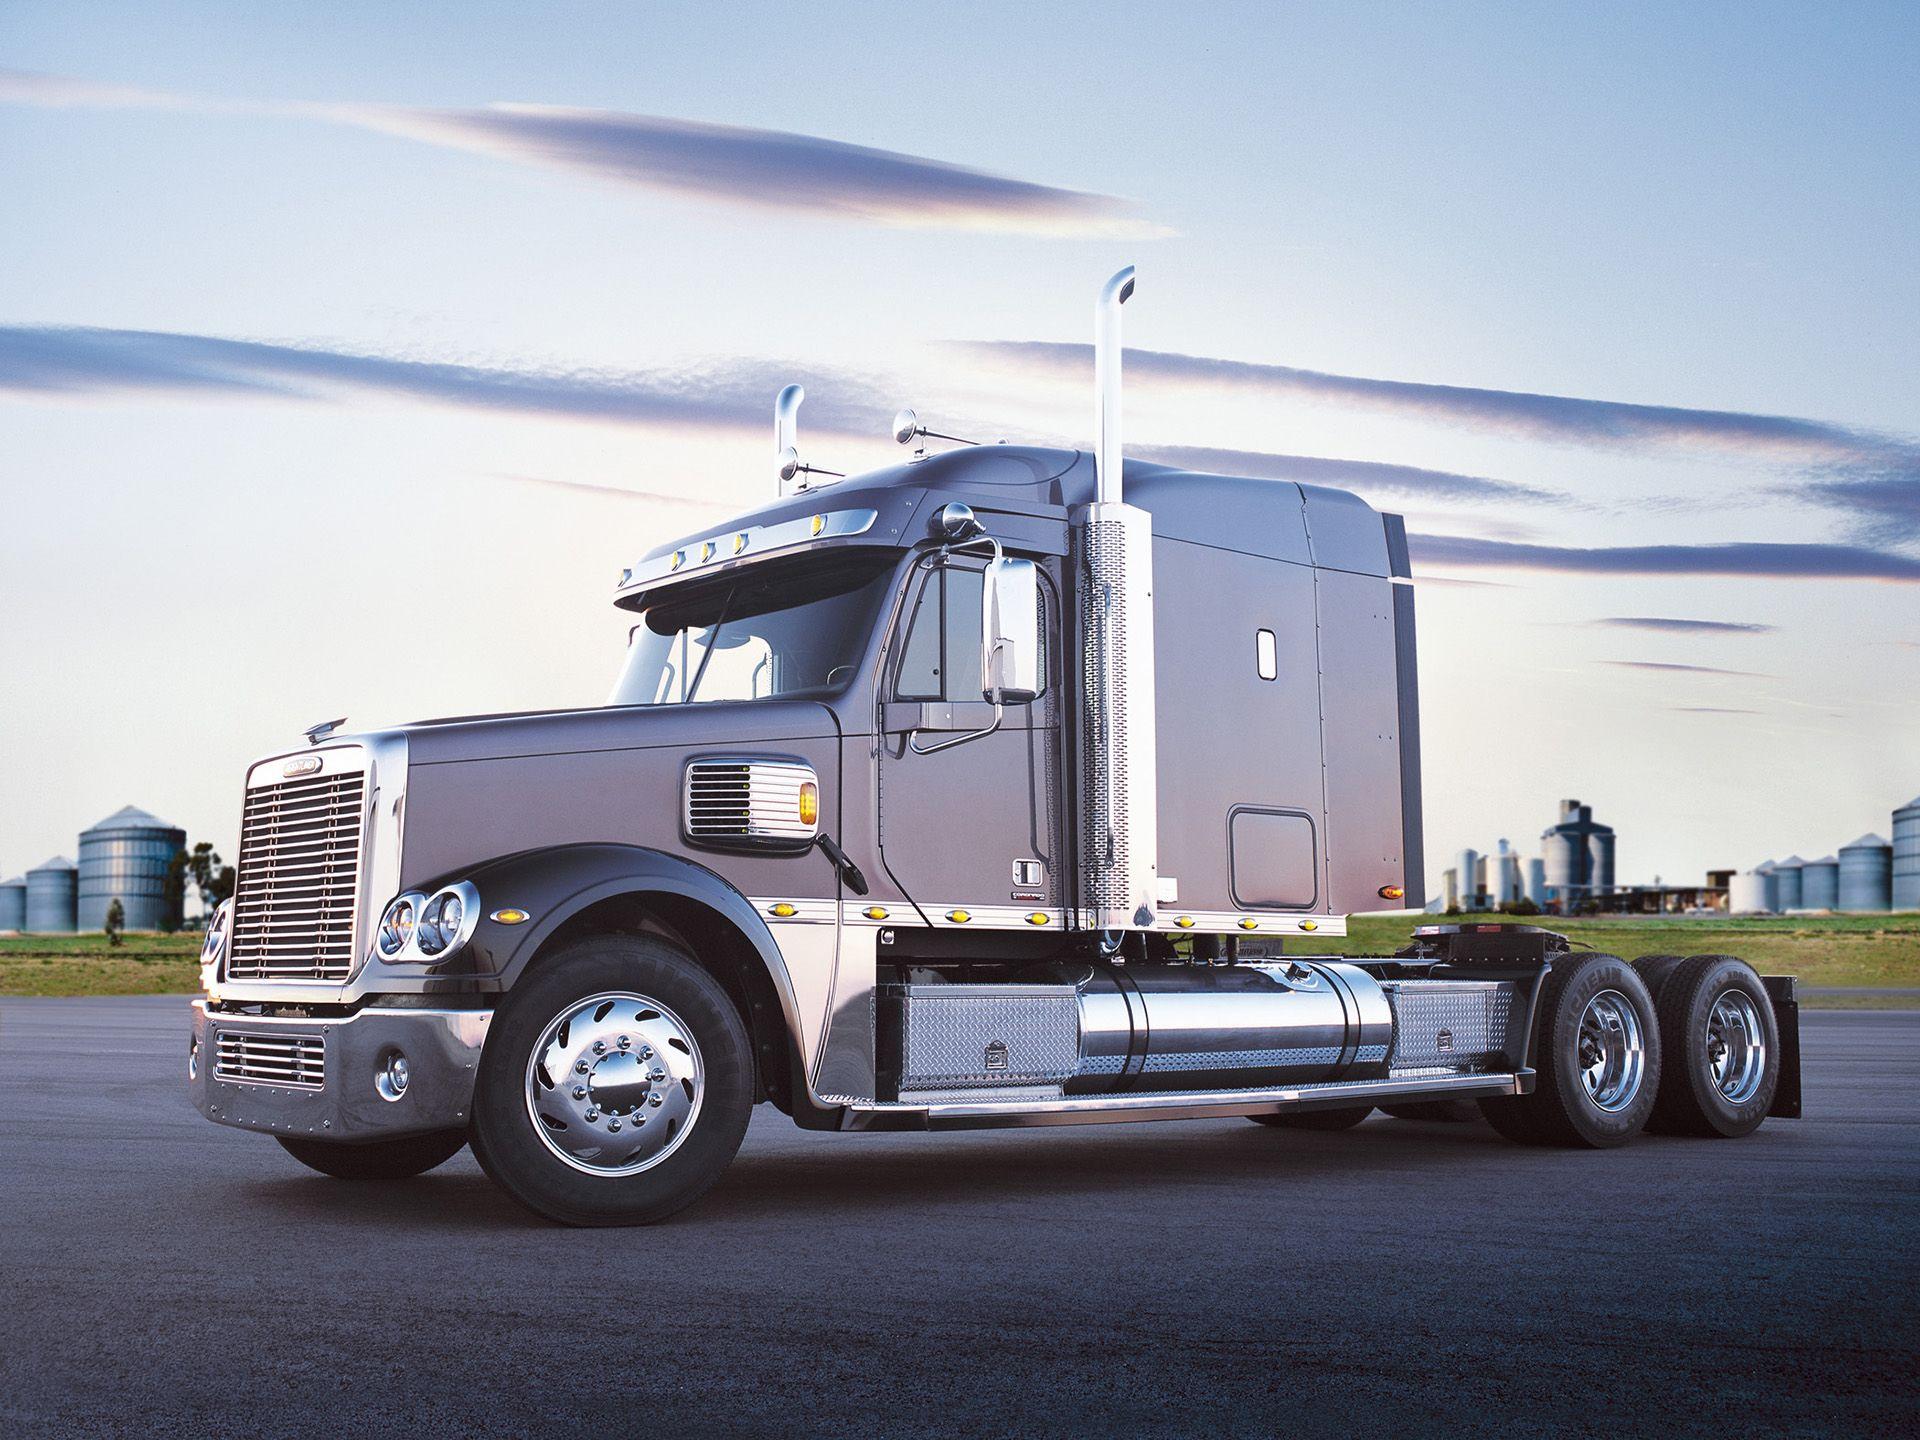 Freightliner Freightliner Coronado 10 Image Freightliner Freightliner Trucks Big Trucks